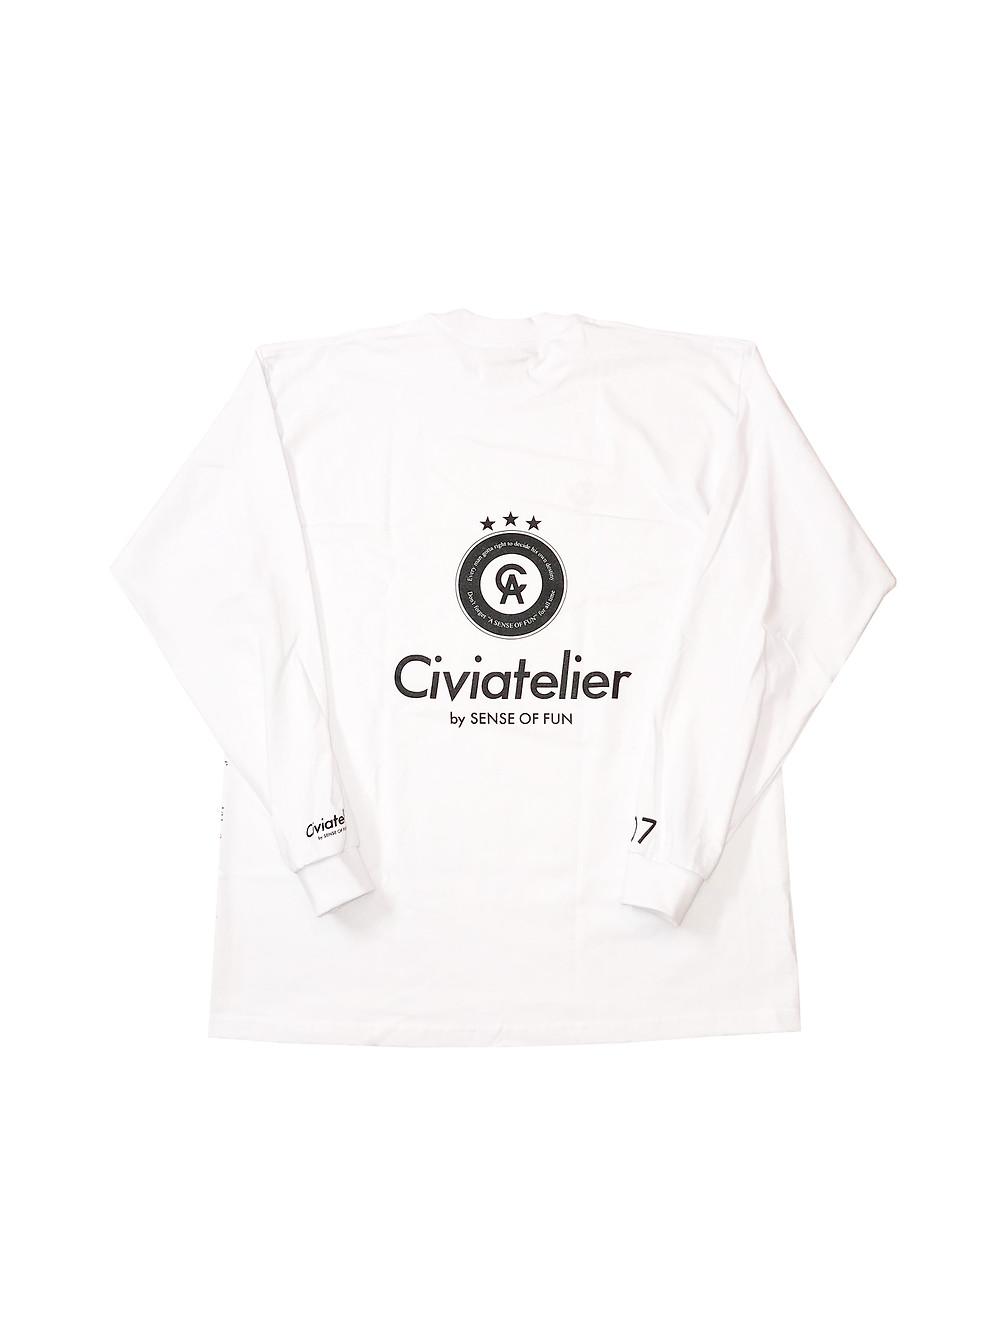 Civiatelier No.1 Dunker Long Sleeve Tee BLK (jordan)